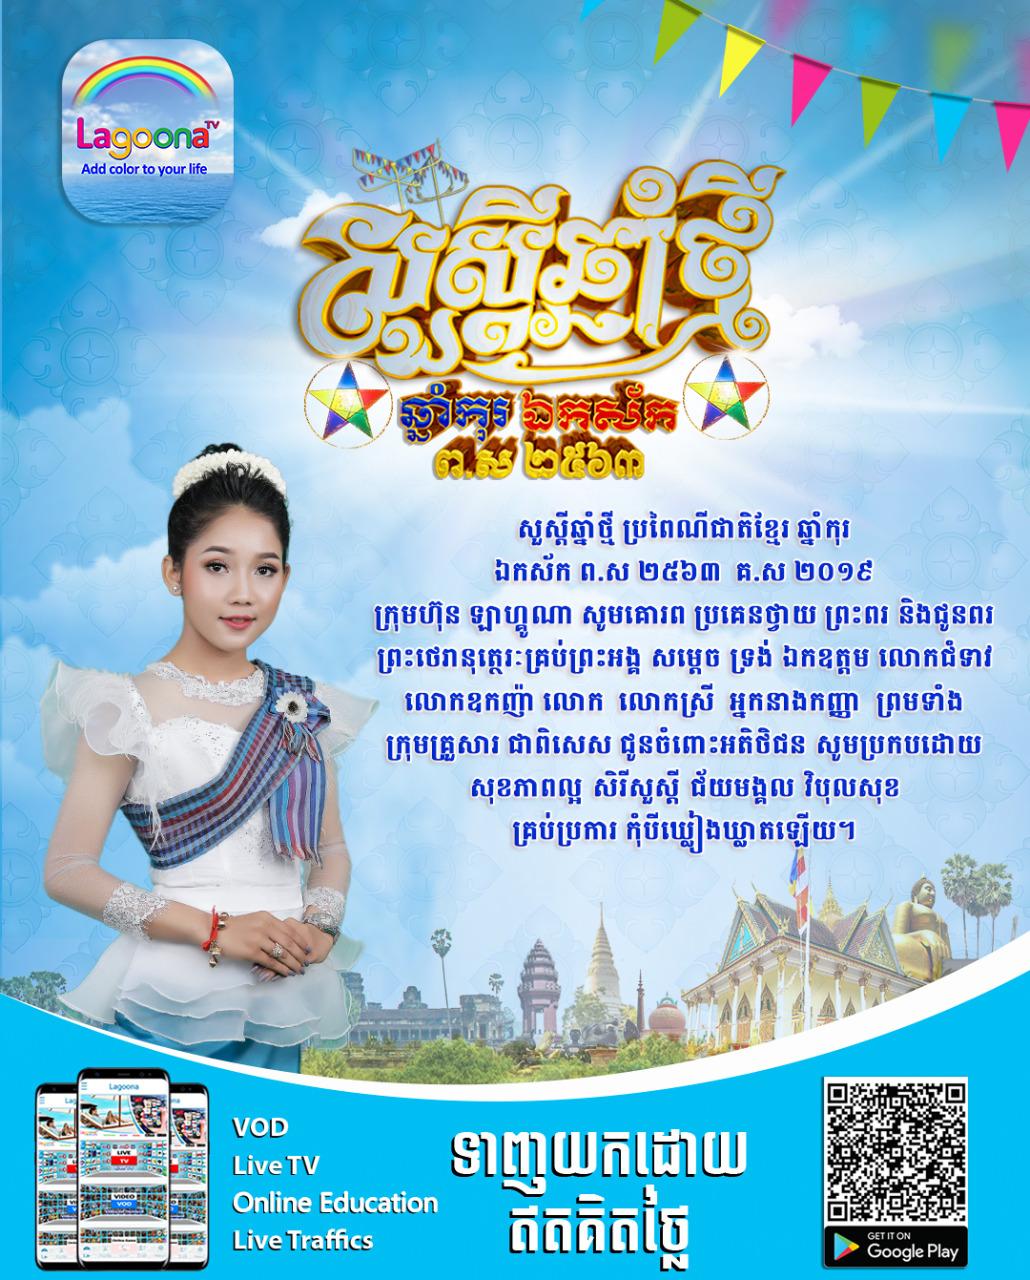 OneTV Promotion